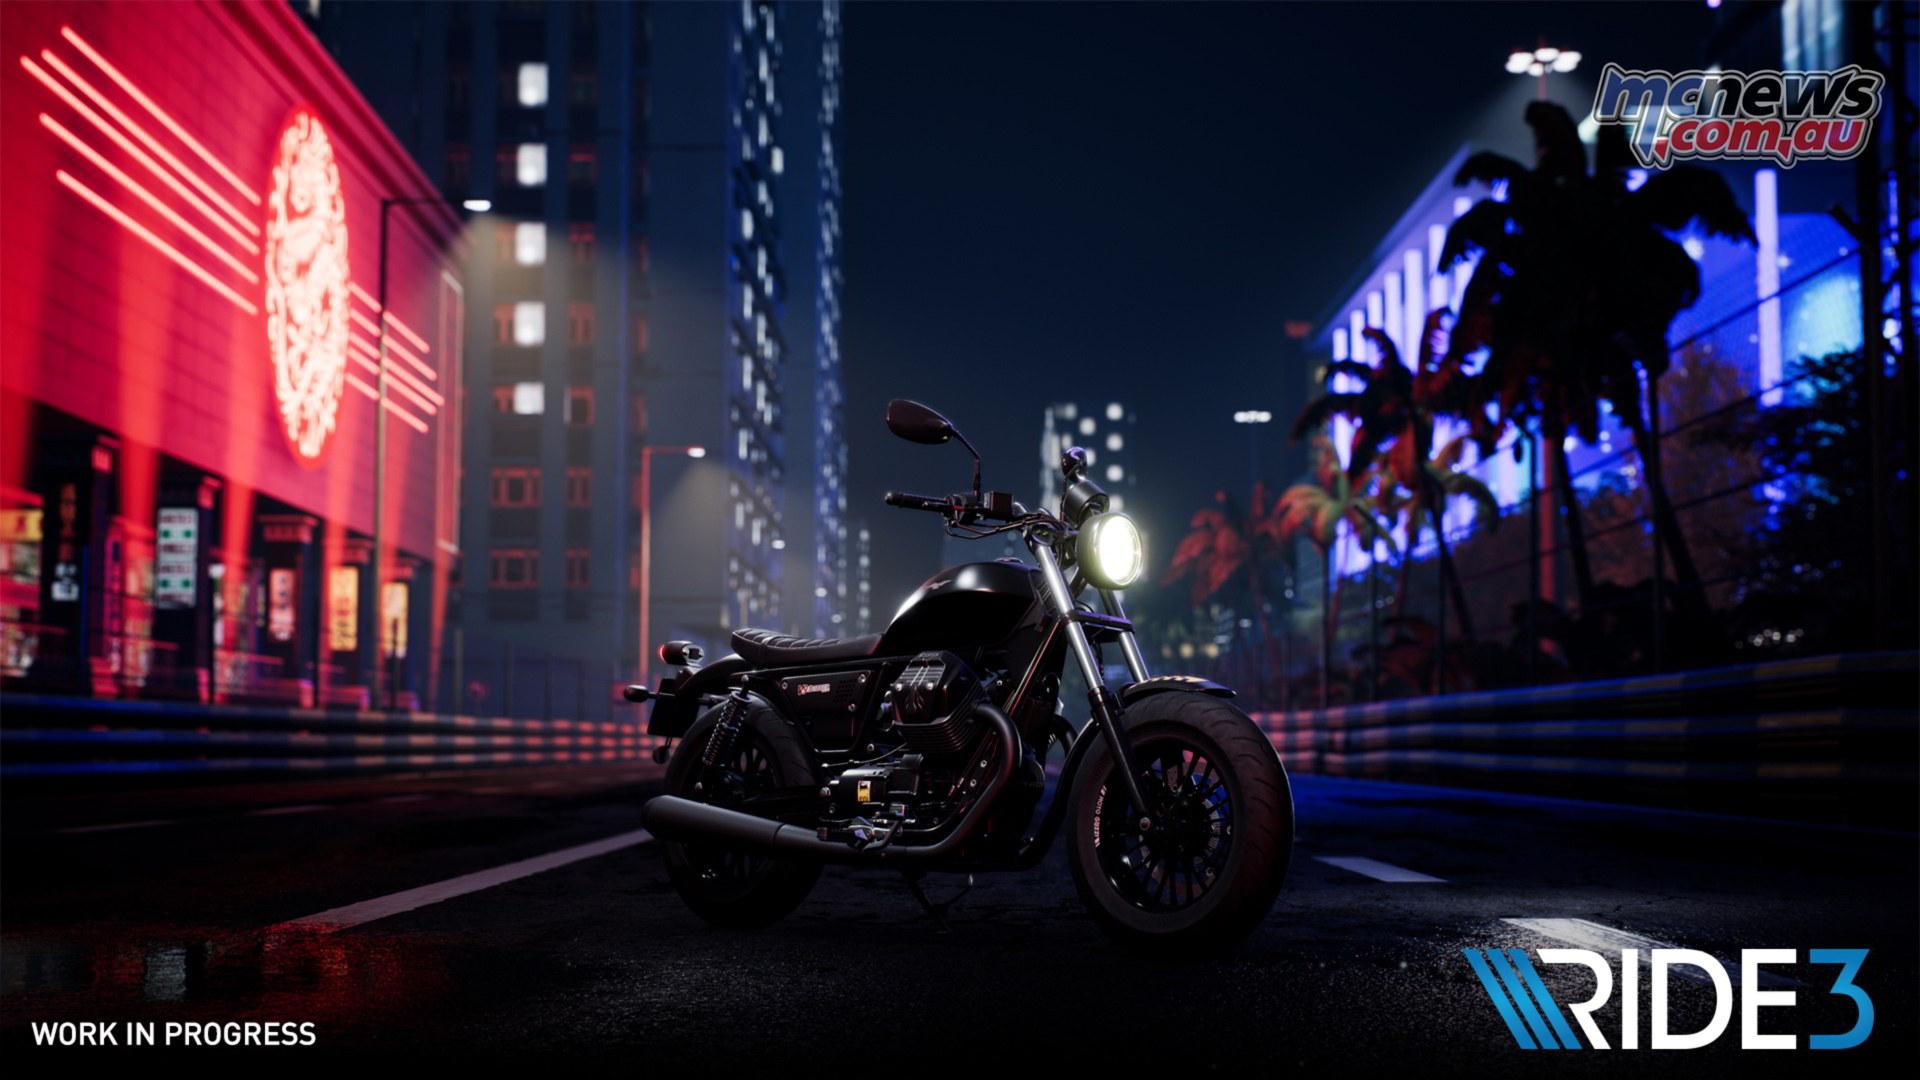 Ride 3 - IGN